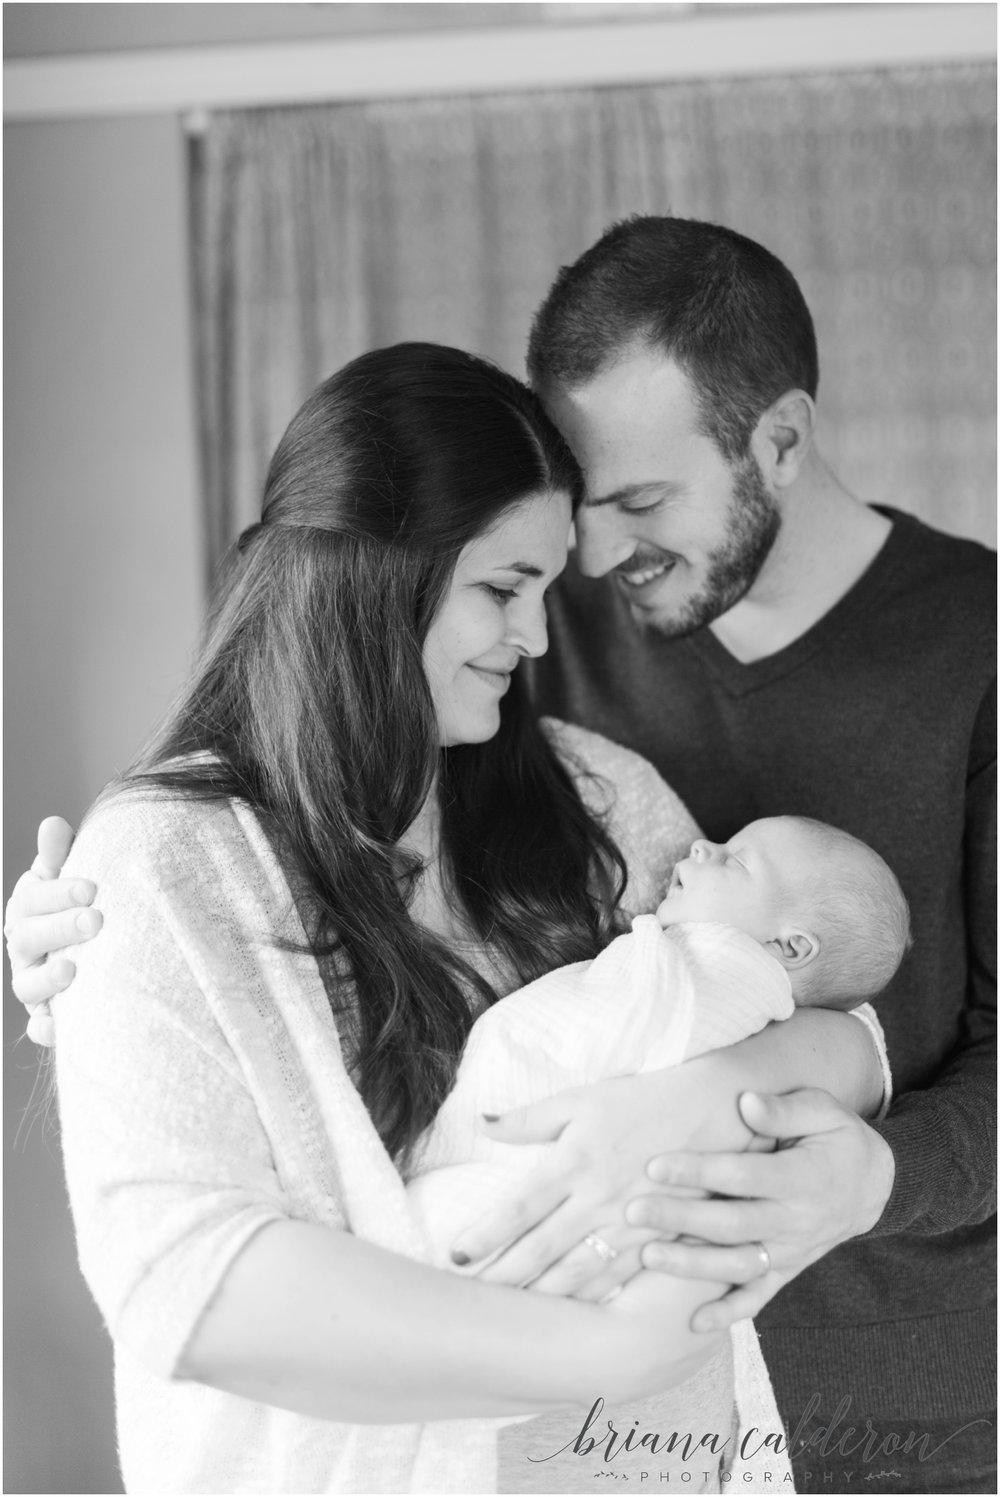 Lifestyle newborn photos by Briana Calderon Photography_0989.jpg